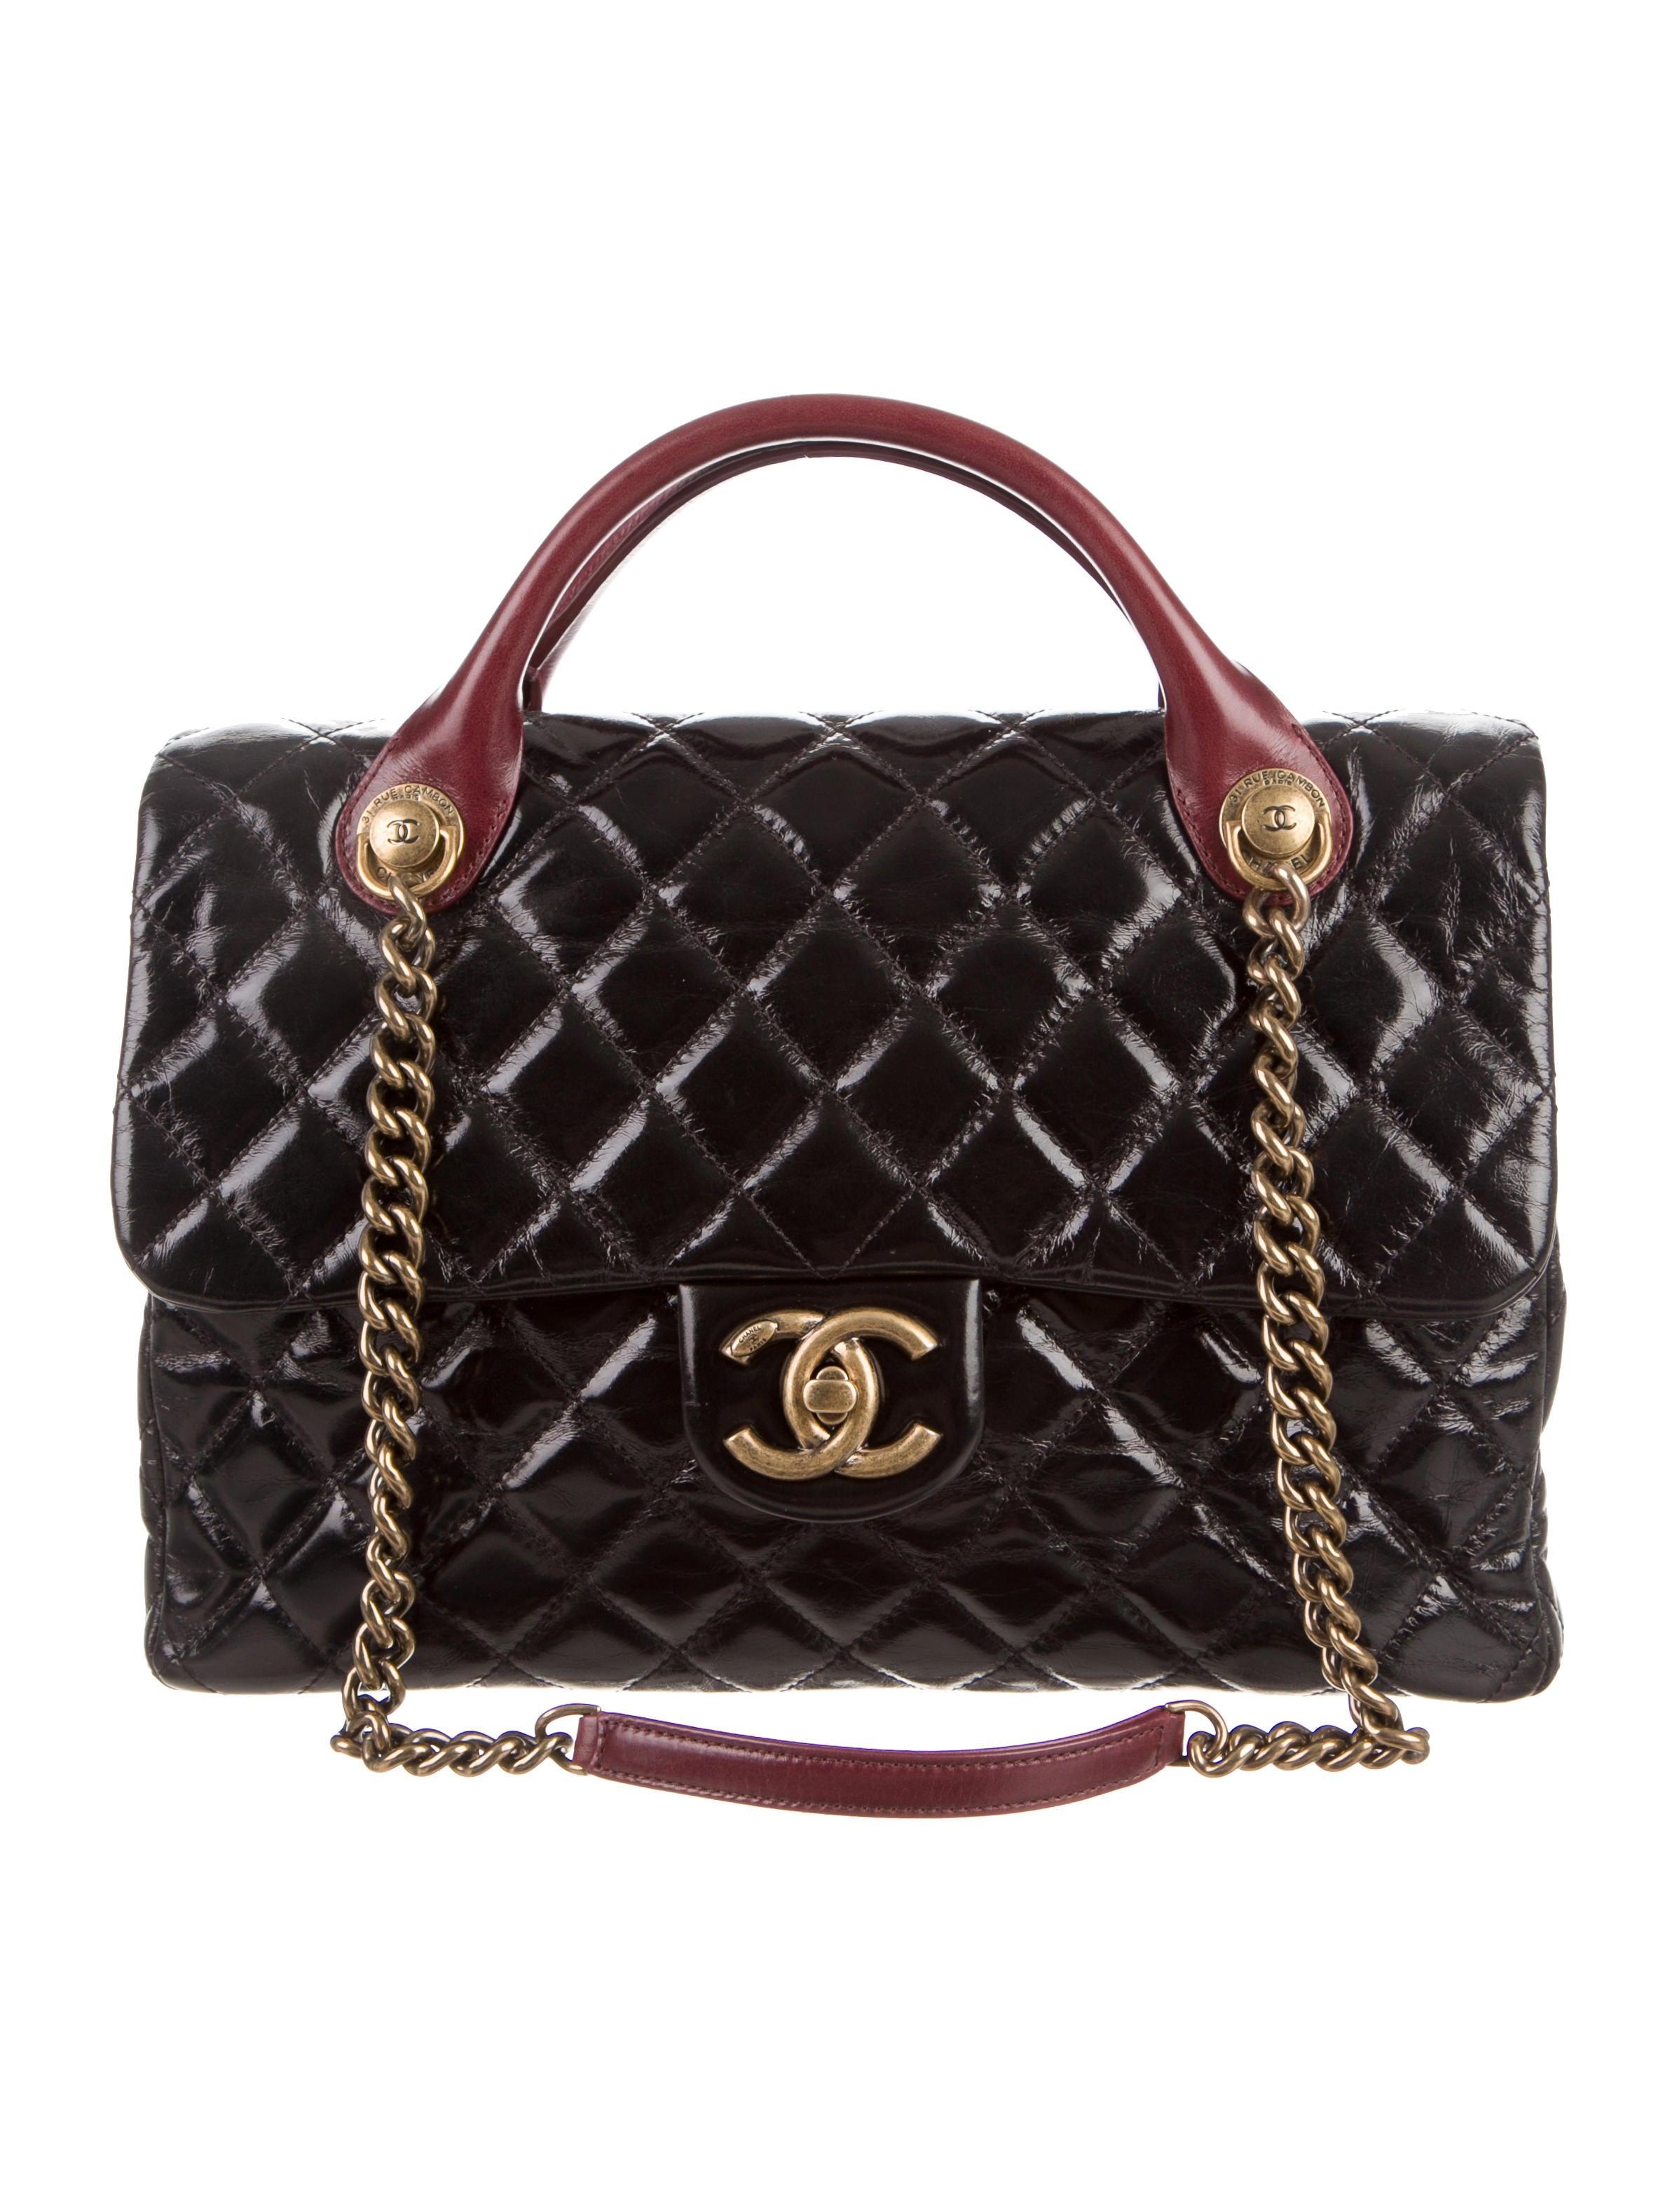 a100a80f5d53 Chanel Large Castle Rock Flap Bag - Handbags - CHA143818 | The RealReal